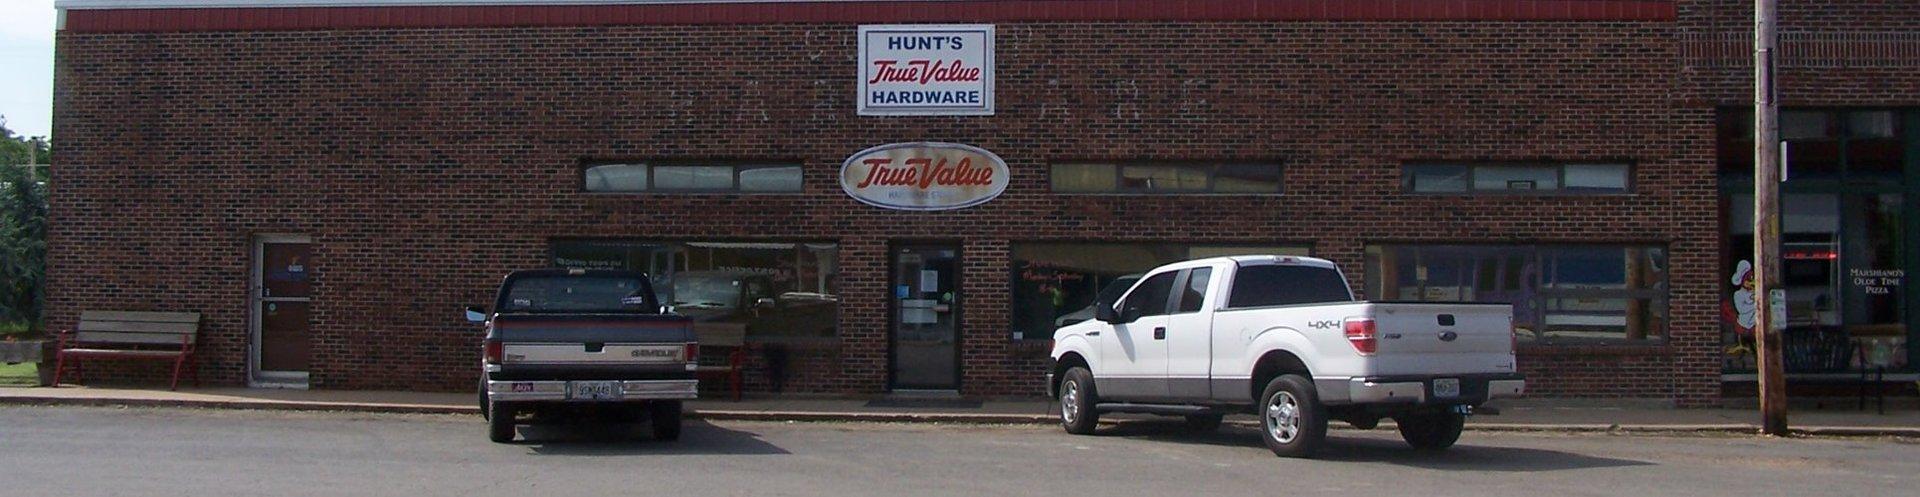 Hunt's Hardware & Guns_Shop